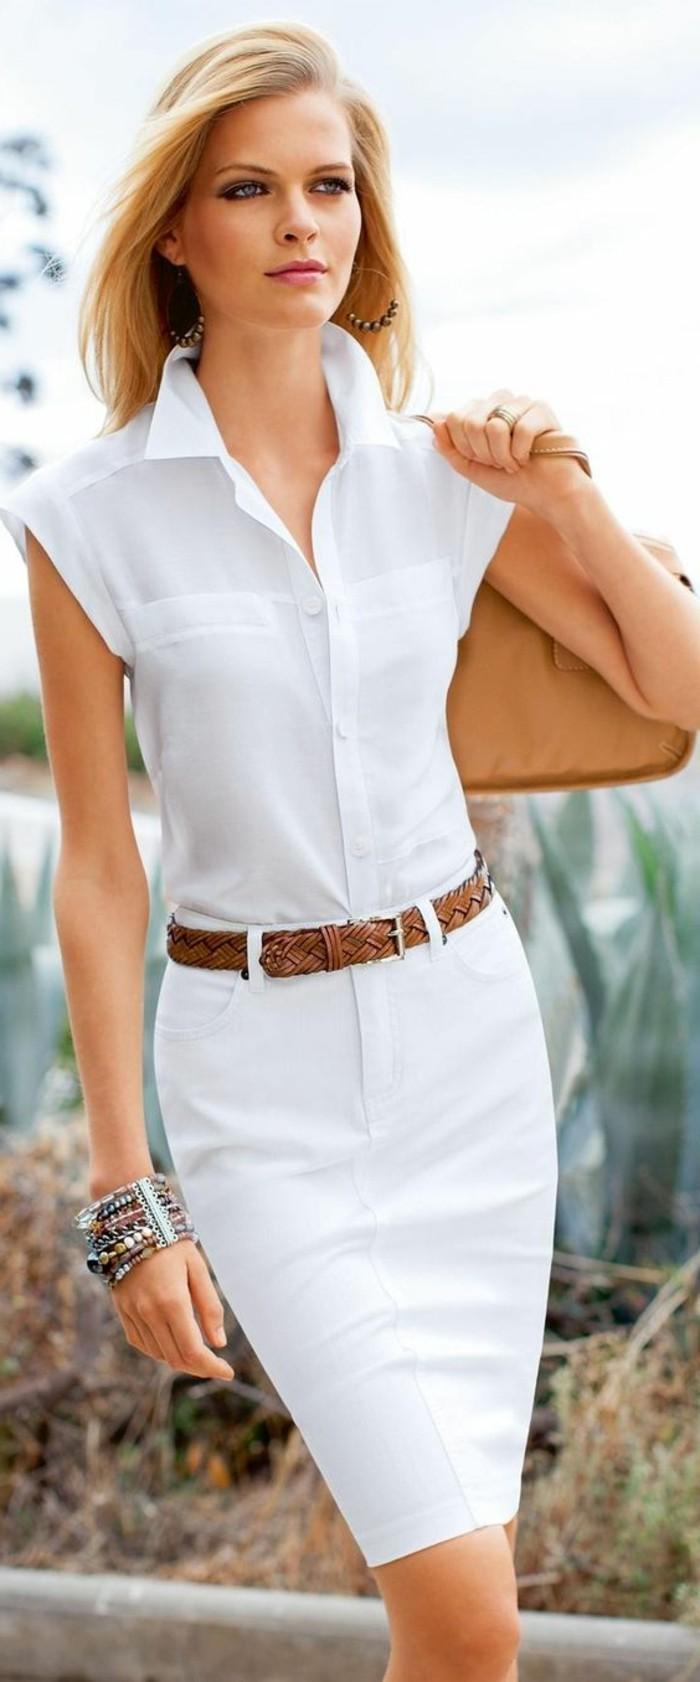 business-hemden-weiß-gürtel